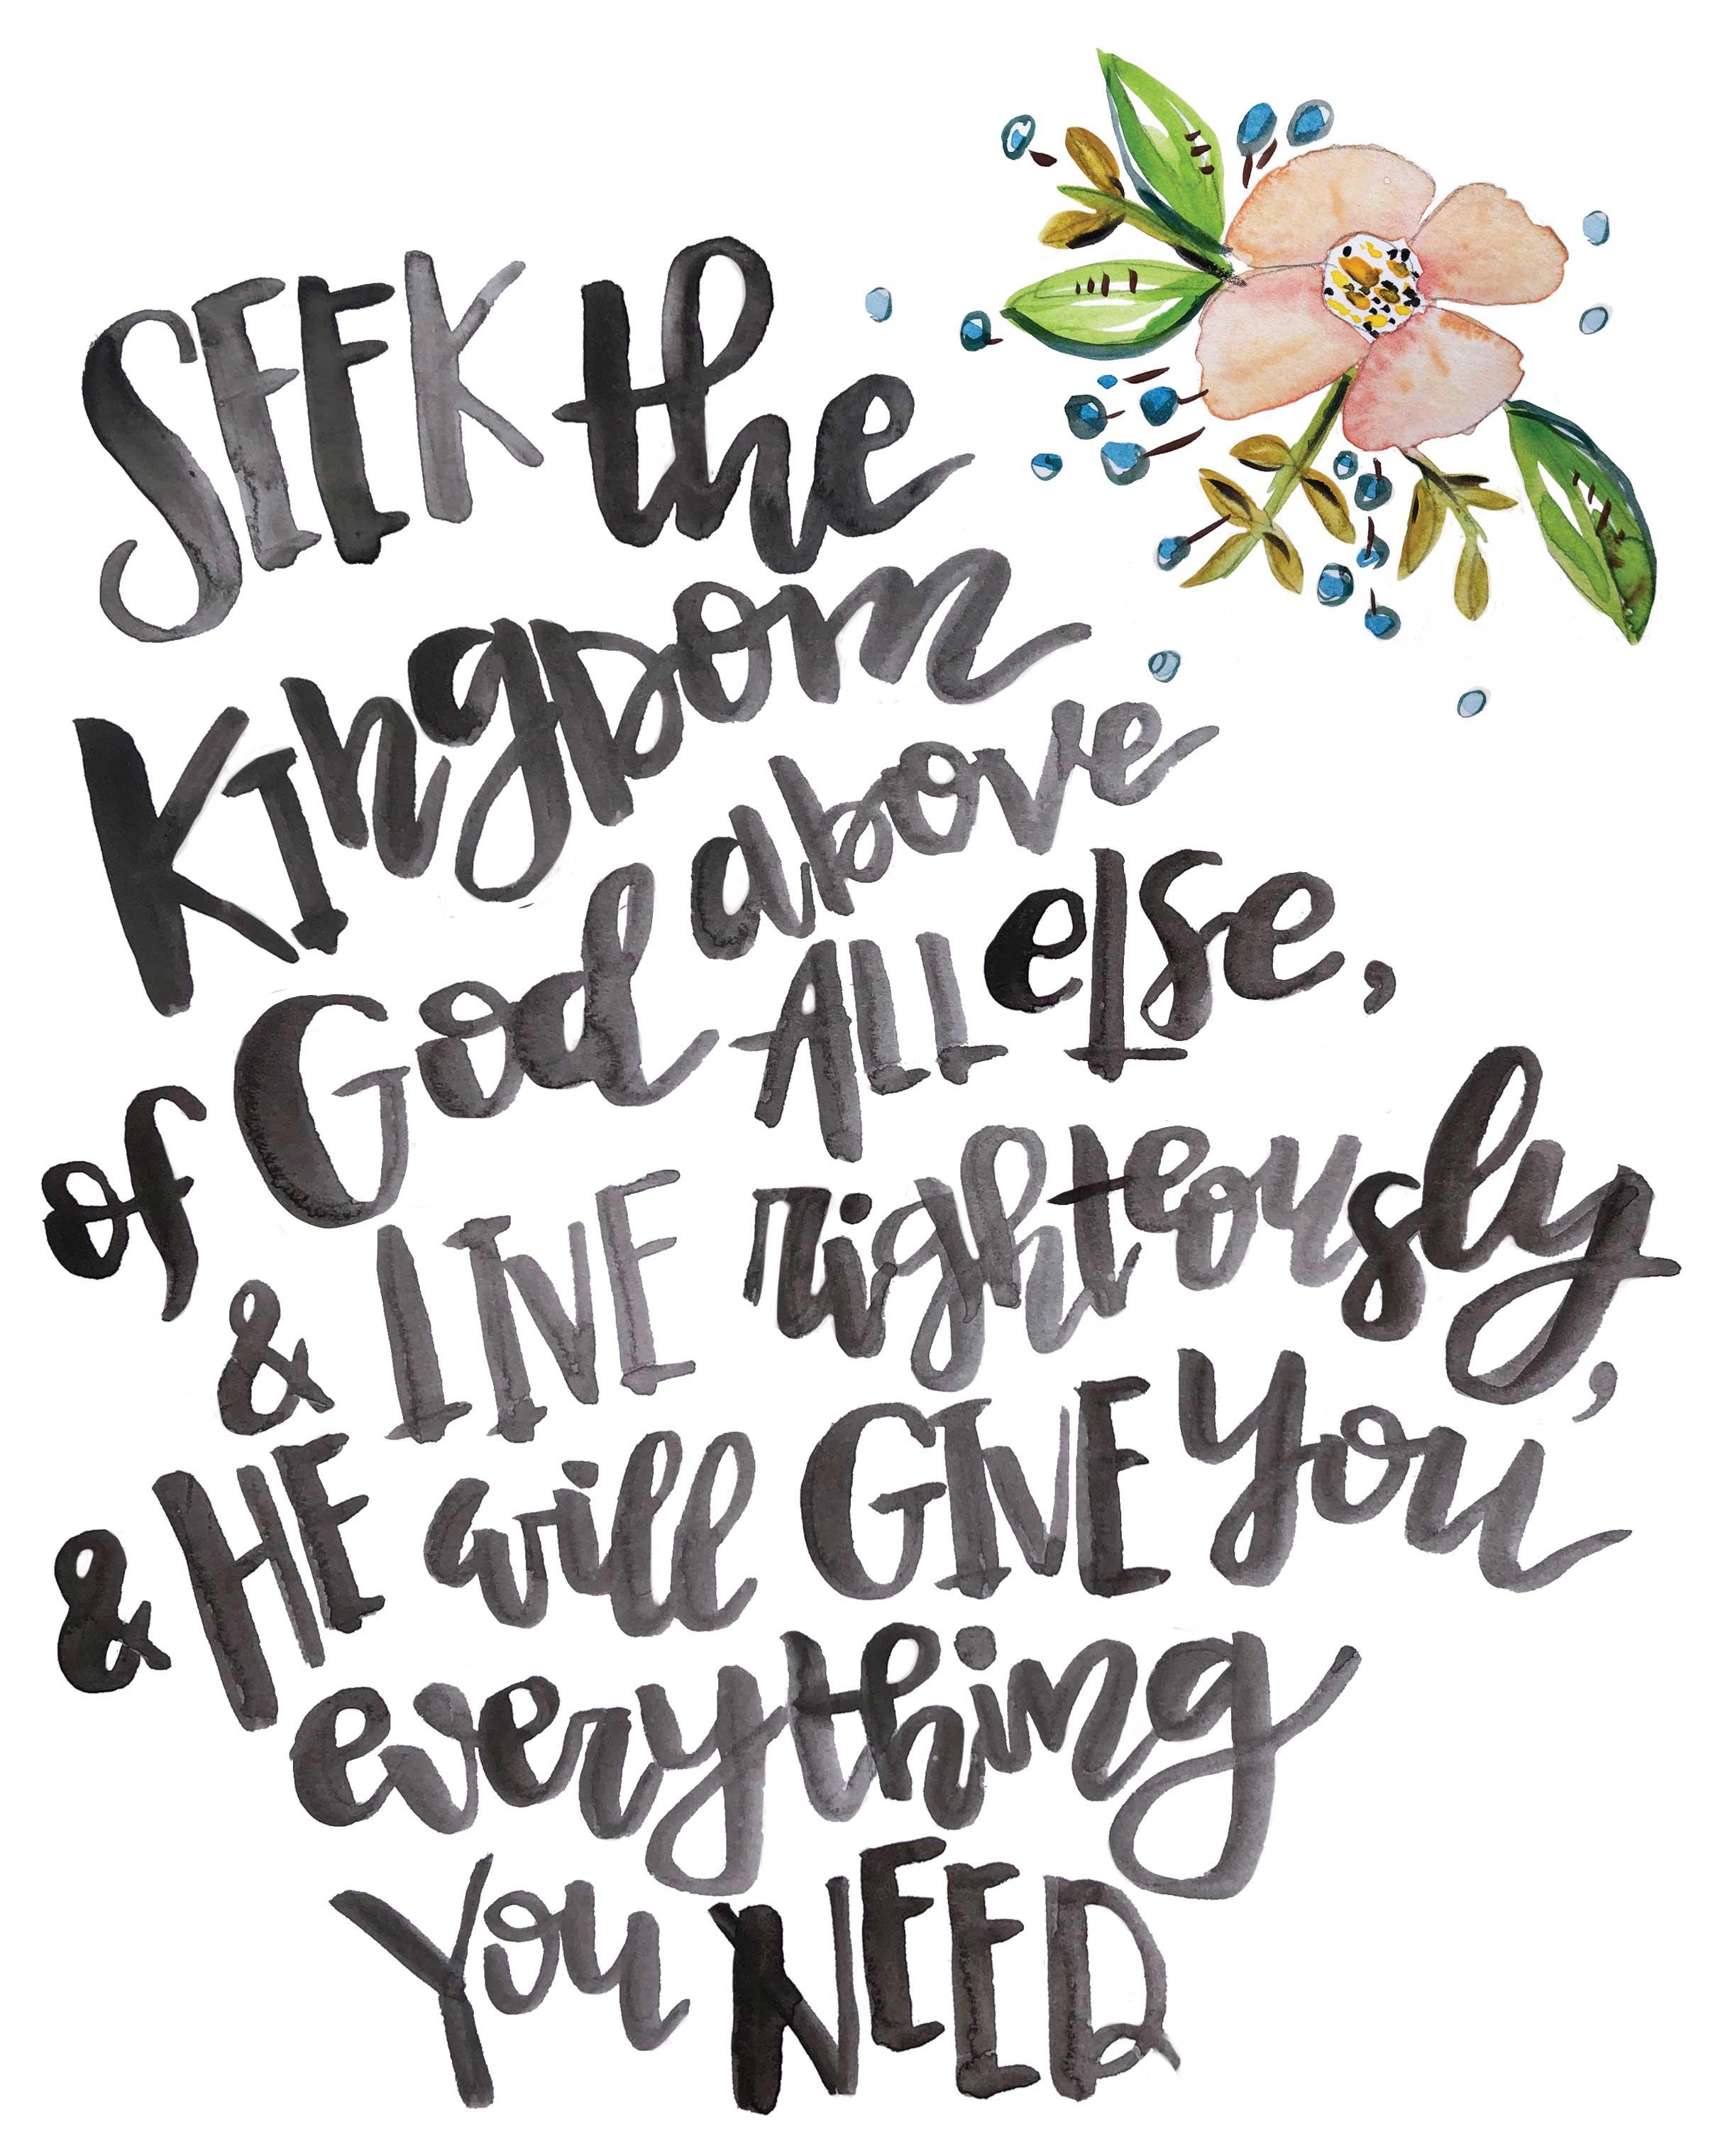 Melissa Lewis Art Hand Lettered Scripture Free 8x10 Print Download.